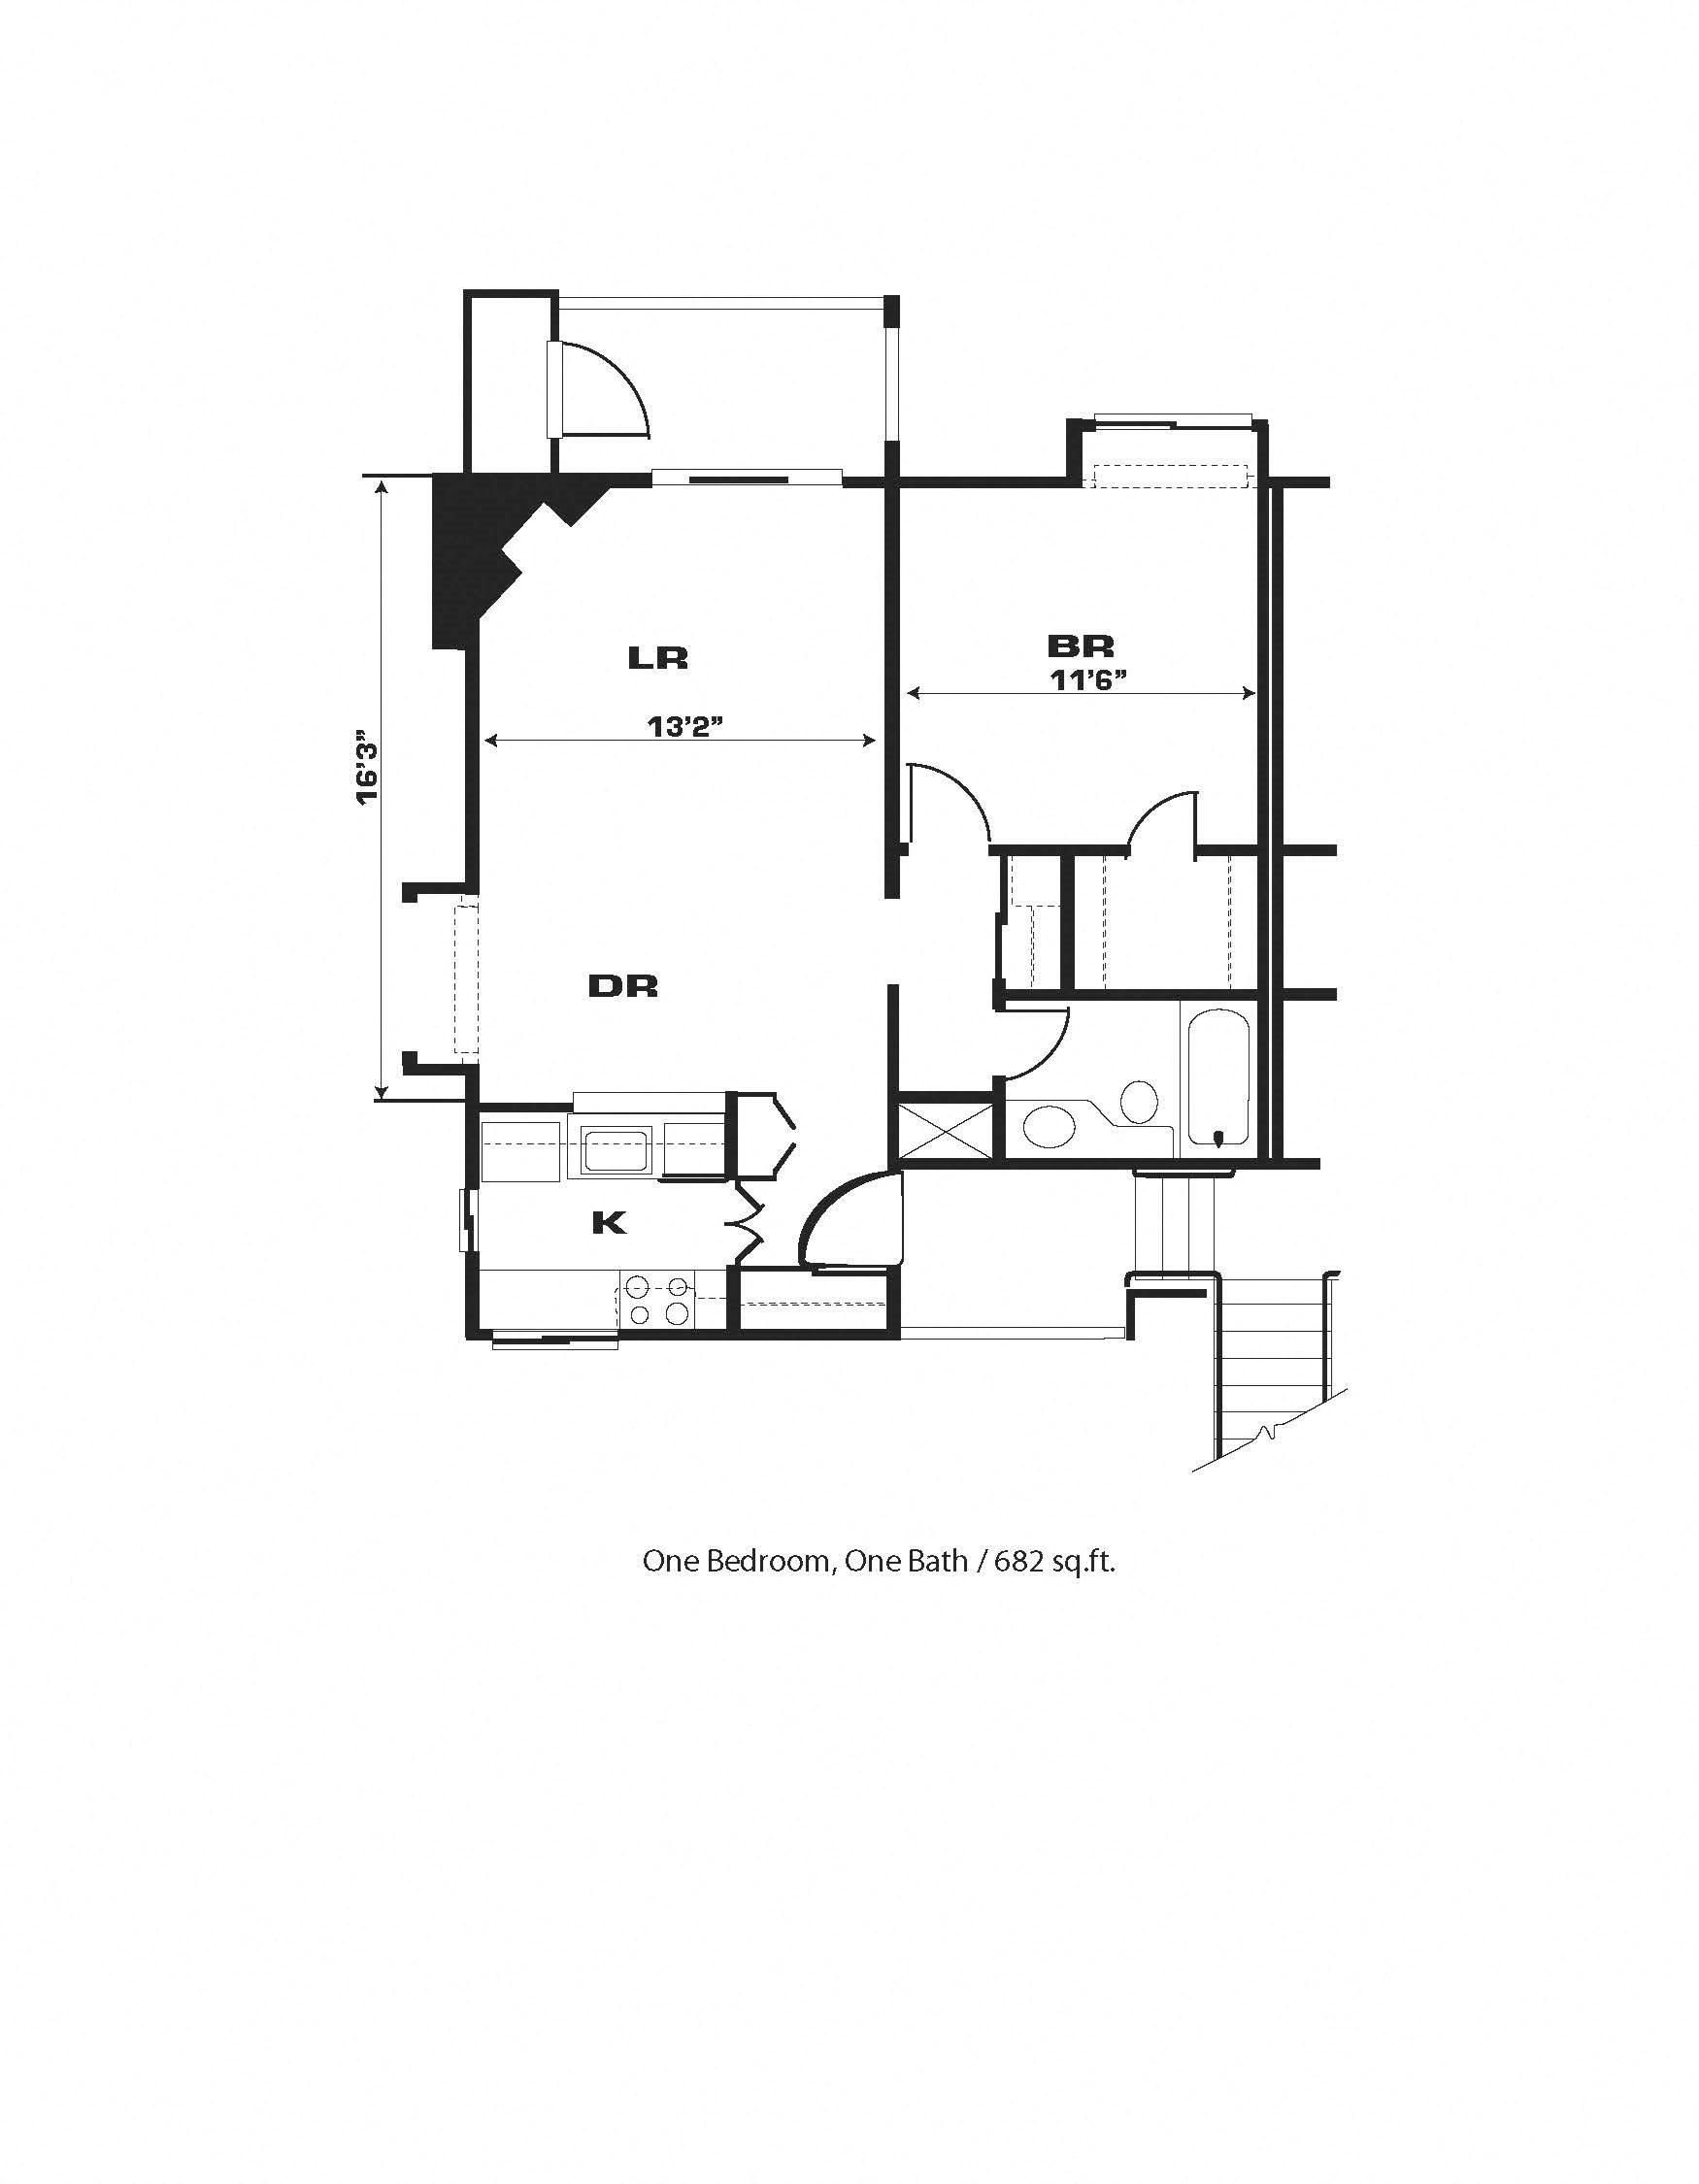 1br/1ba, Fireplace Floor Plan 5